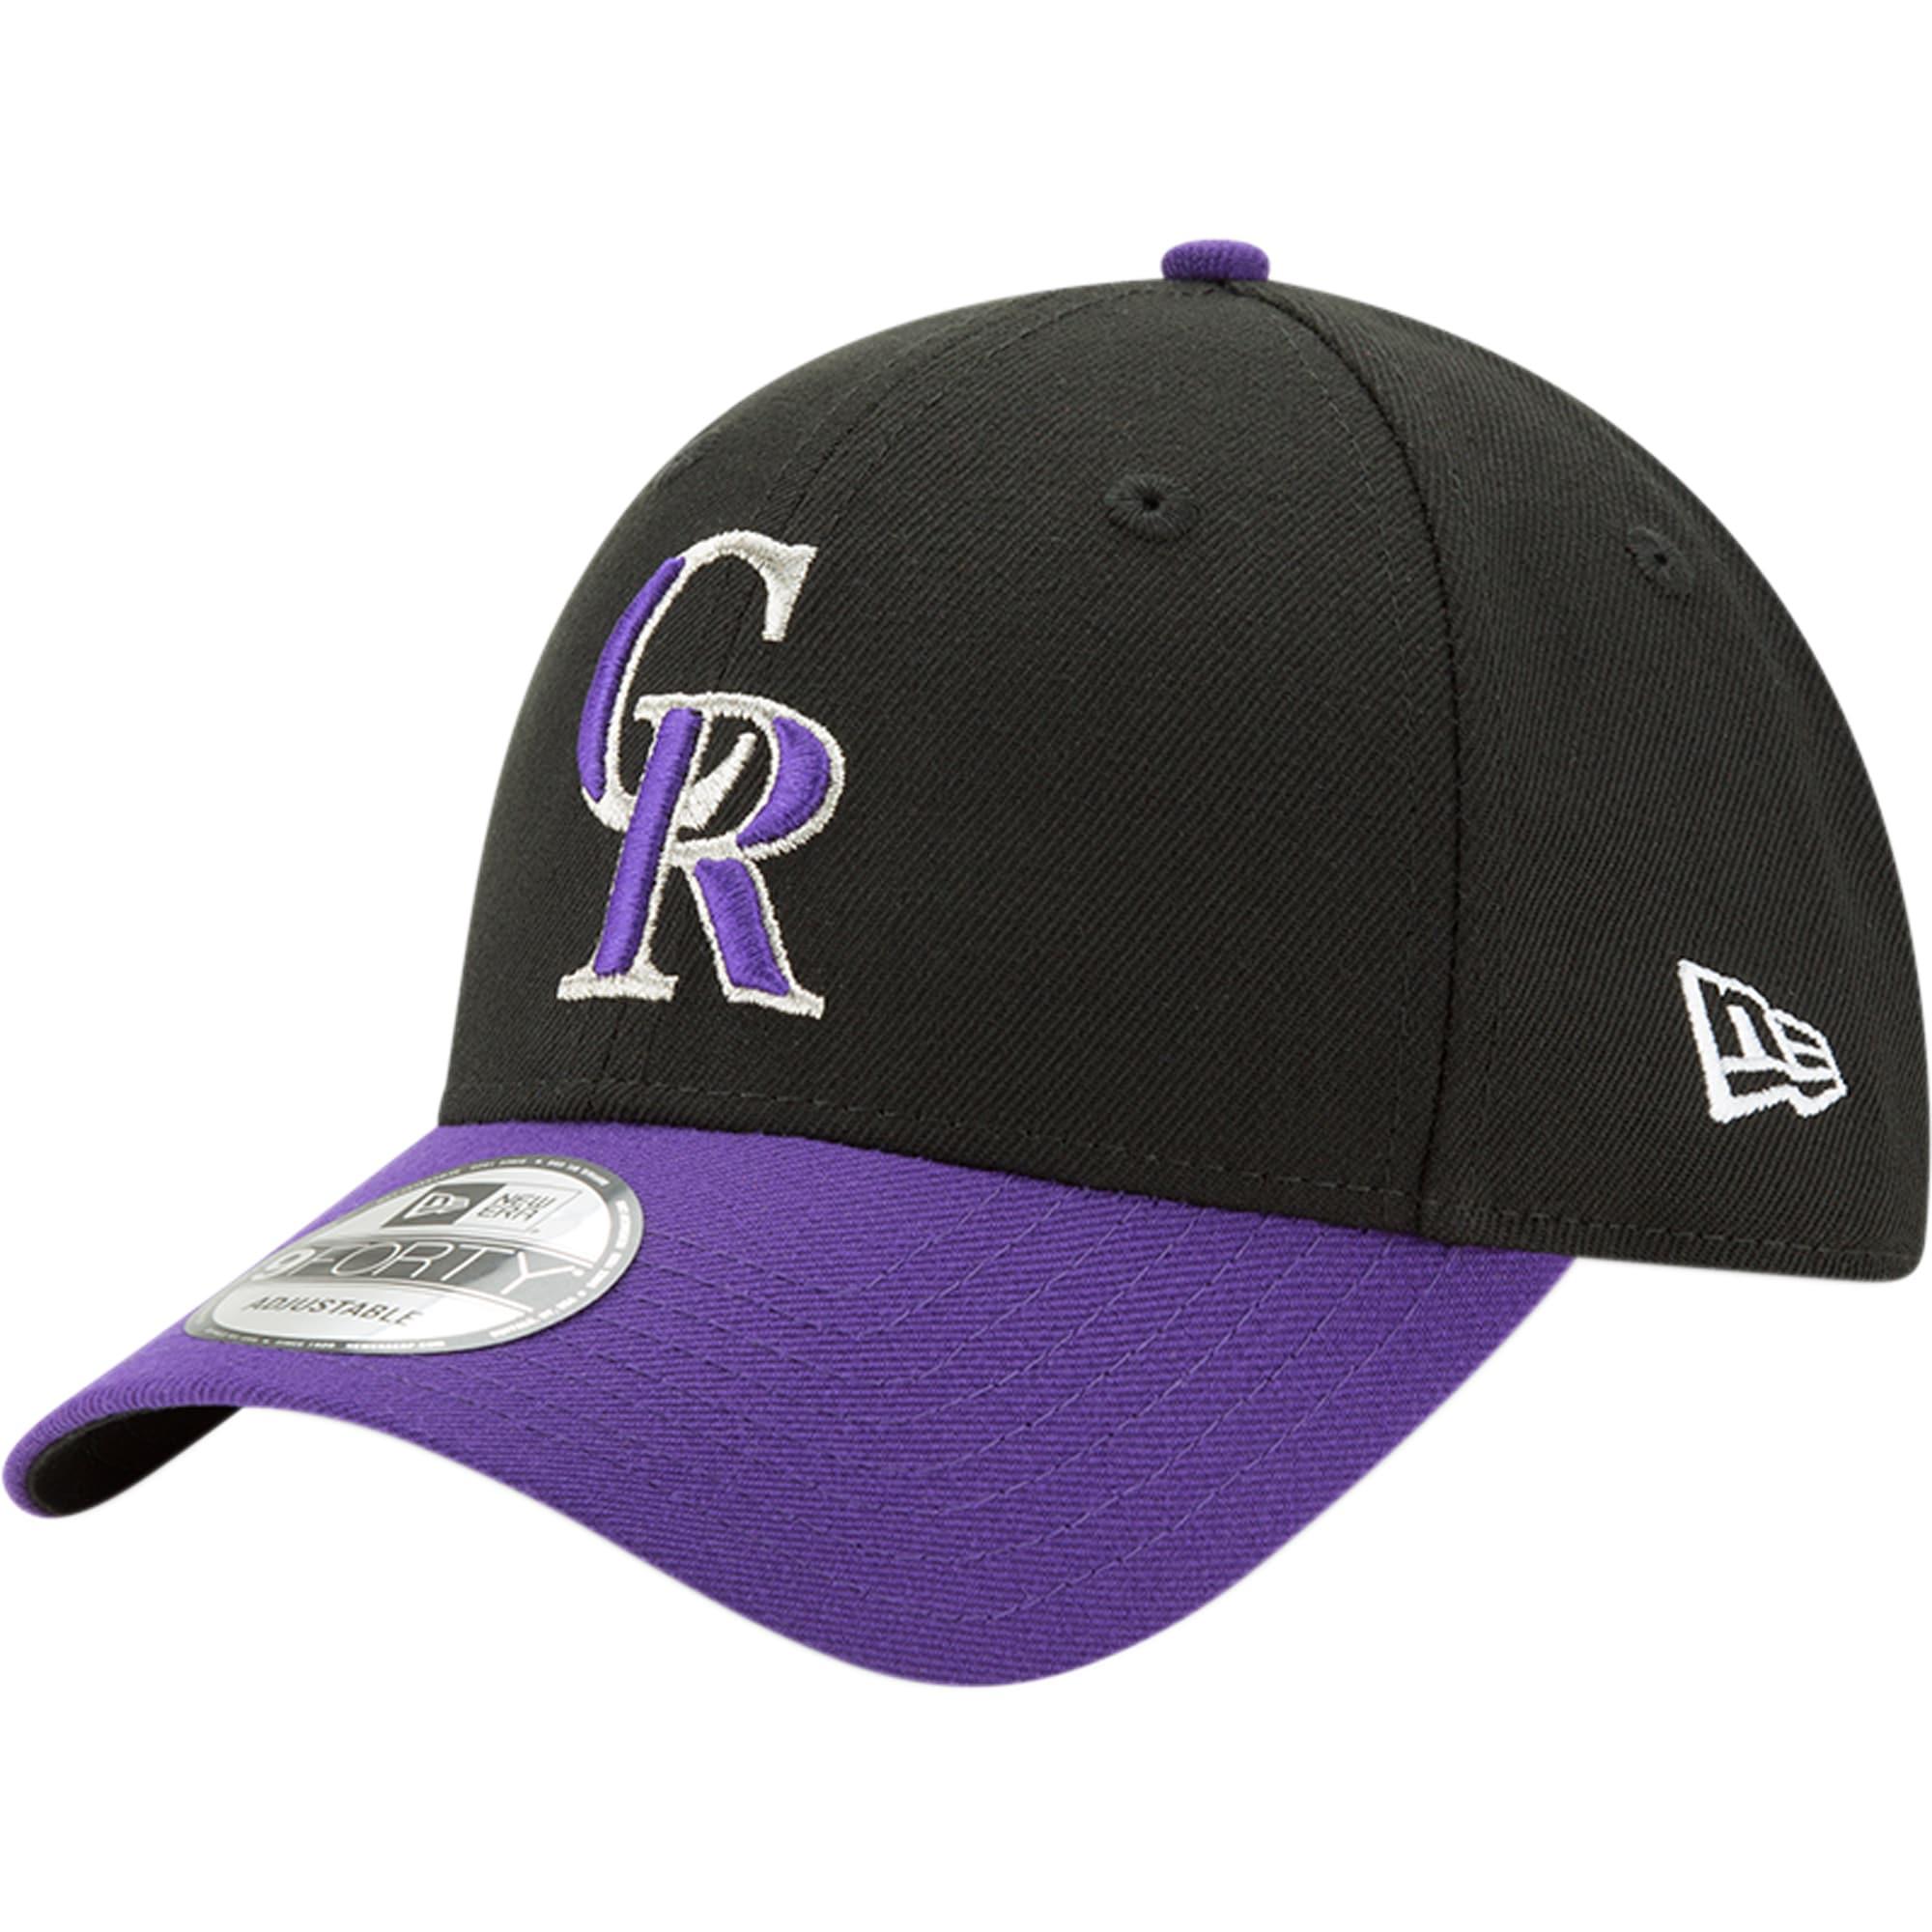 Colorado Rockies New Era Alternate The League 9FORTY Adjustable Hat - Black/Purple